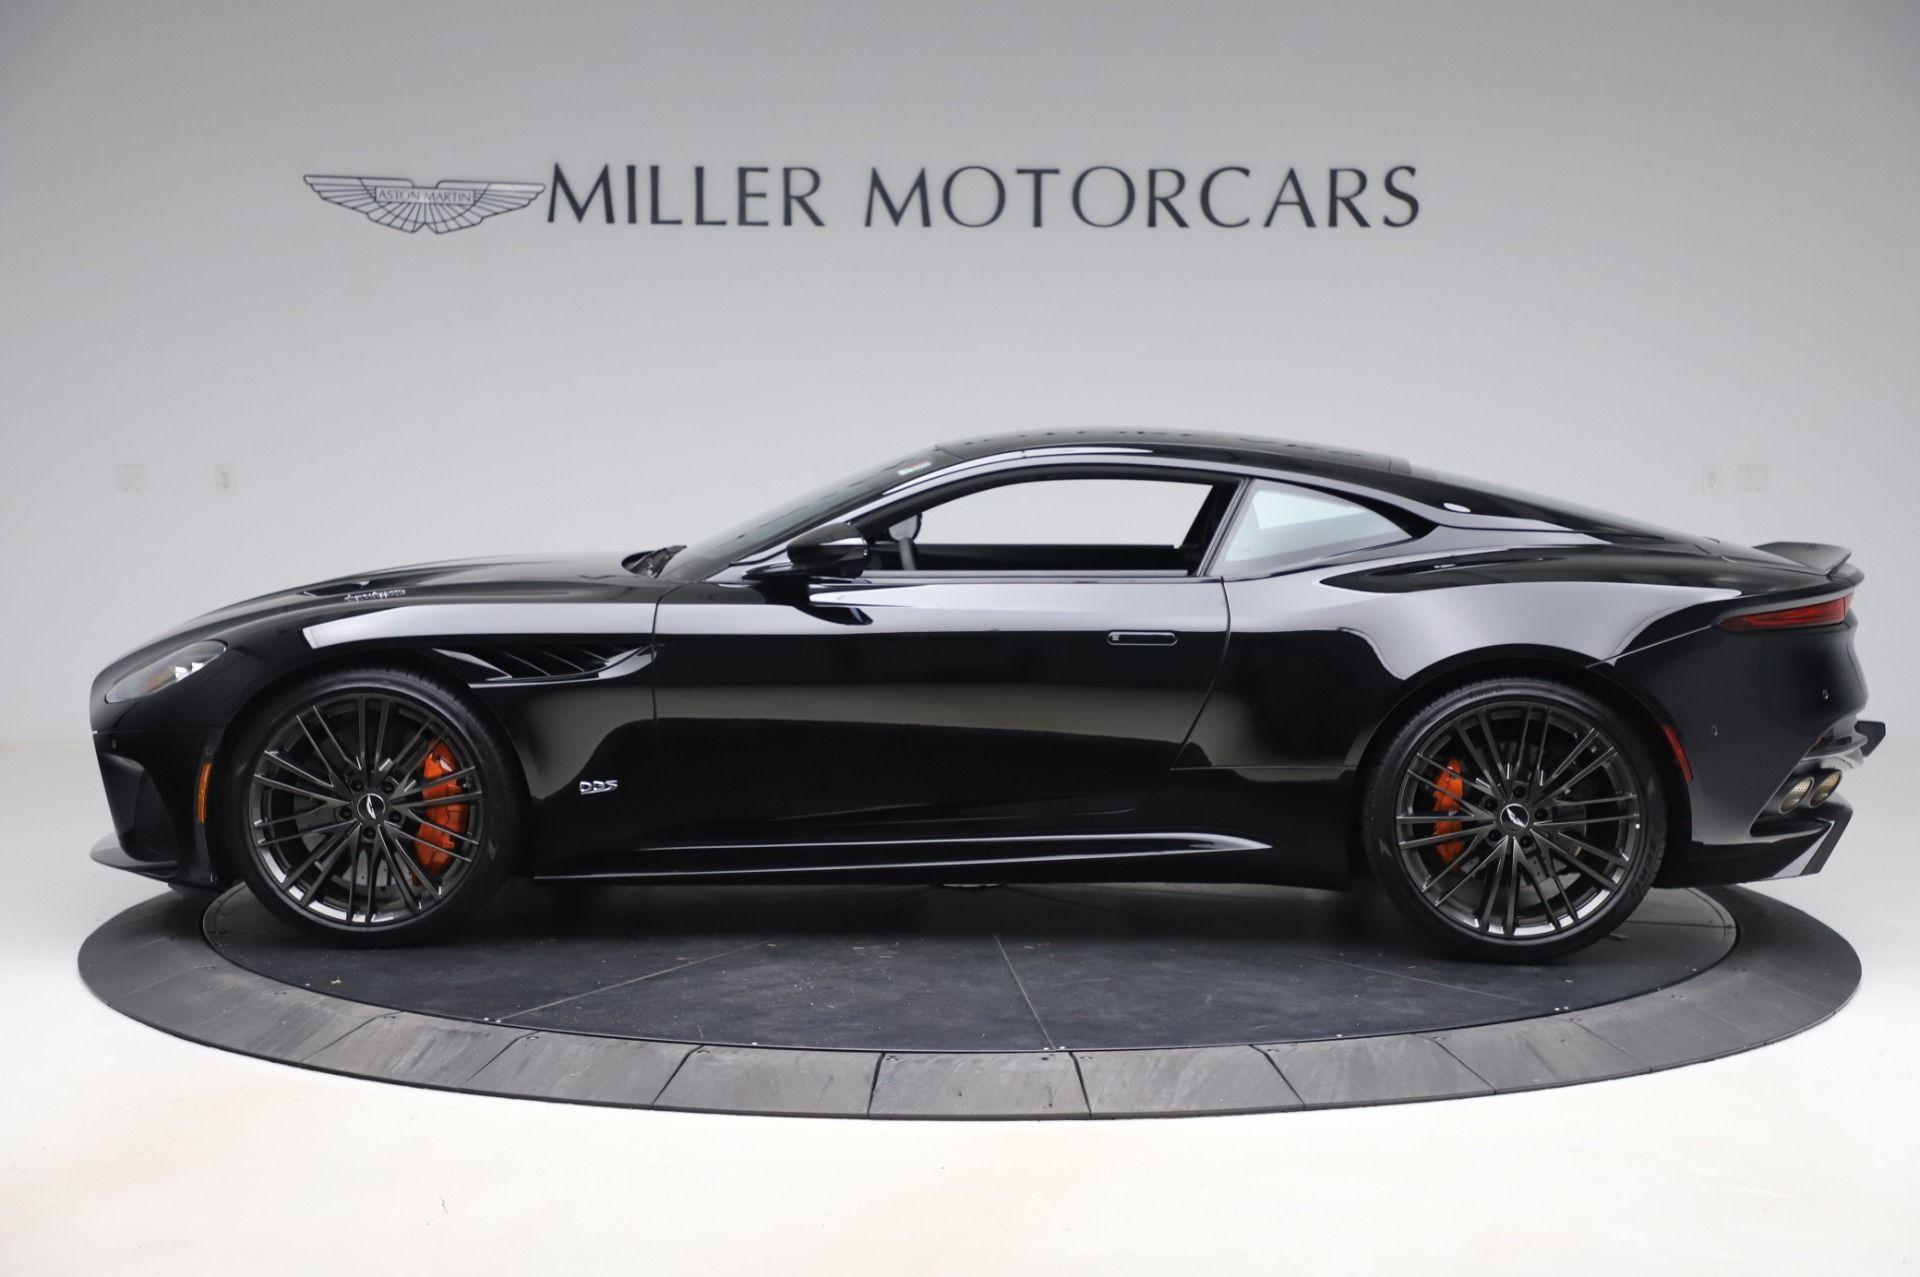 2020 Aston Martin Dbs Superleggera Coupe Miller Motorcars United States For Sale On Luxurypulse In 2020 Aston Martin Dbs Aston Martin Superleggera